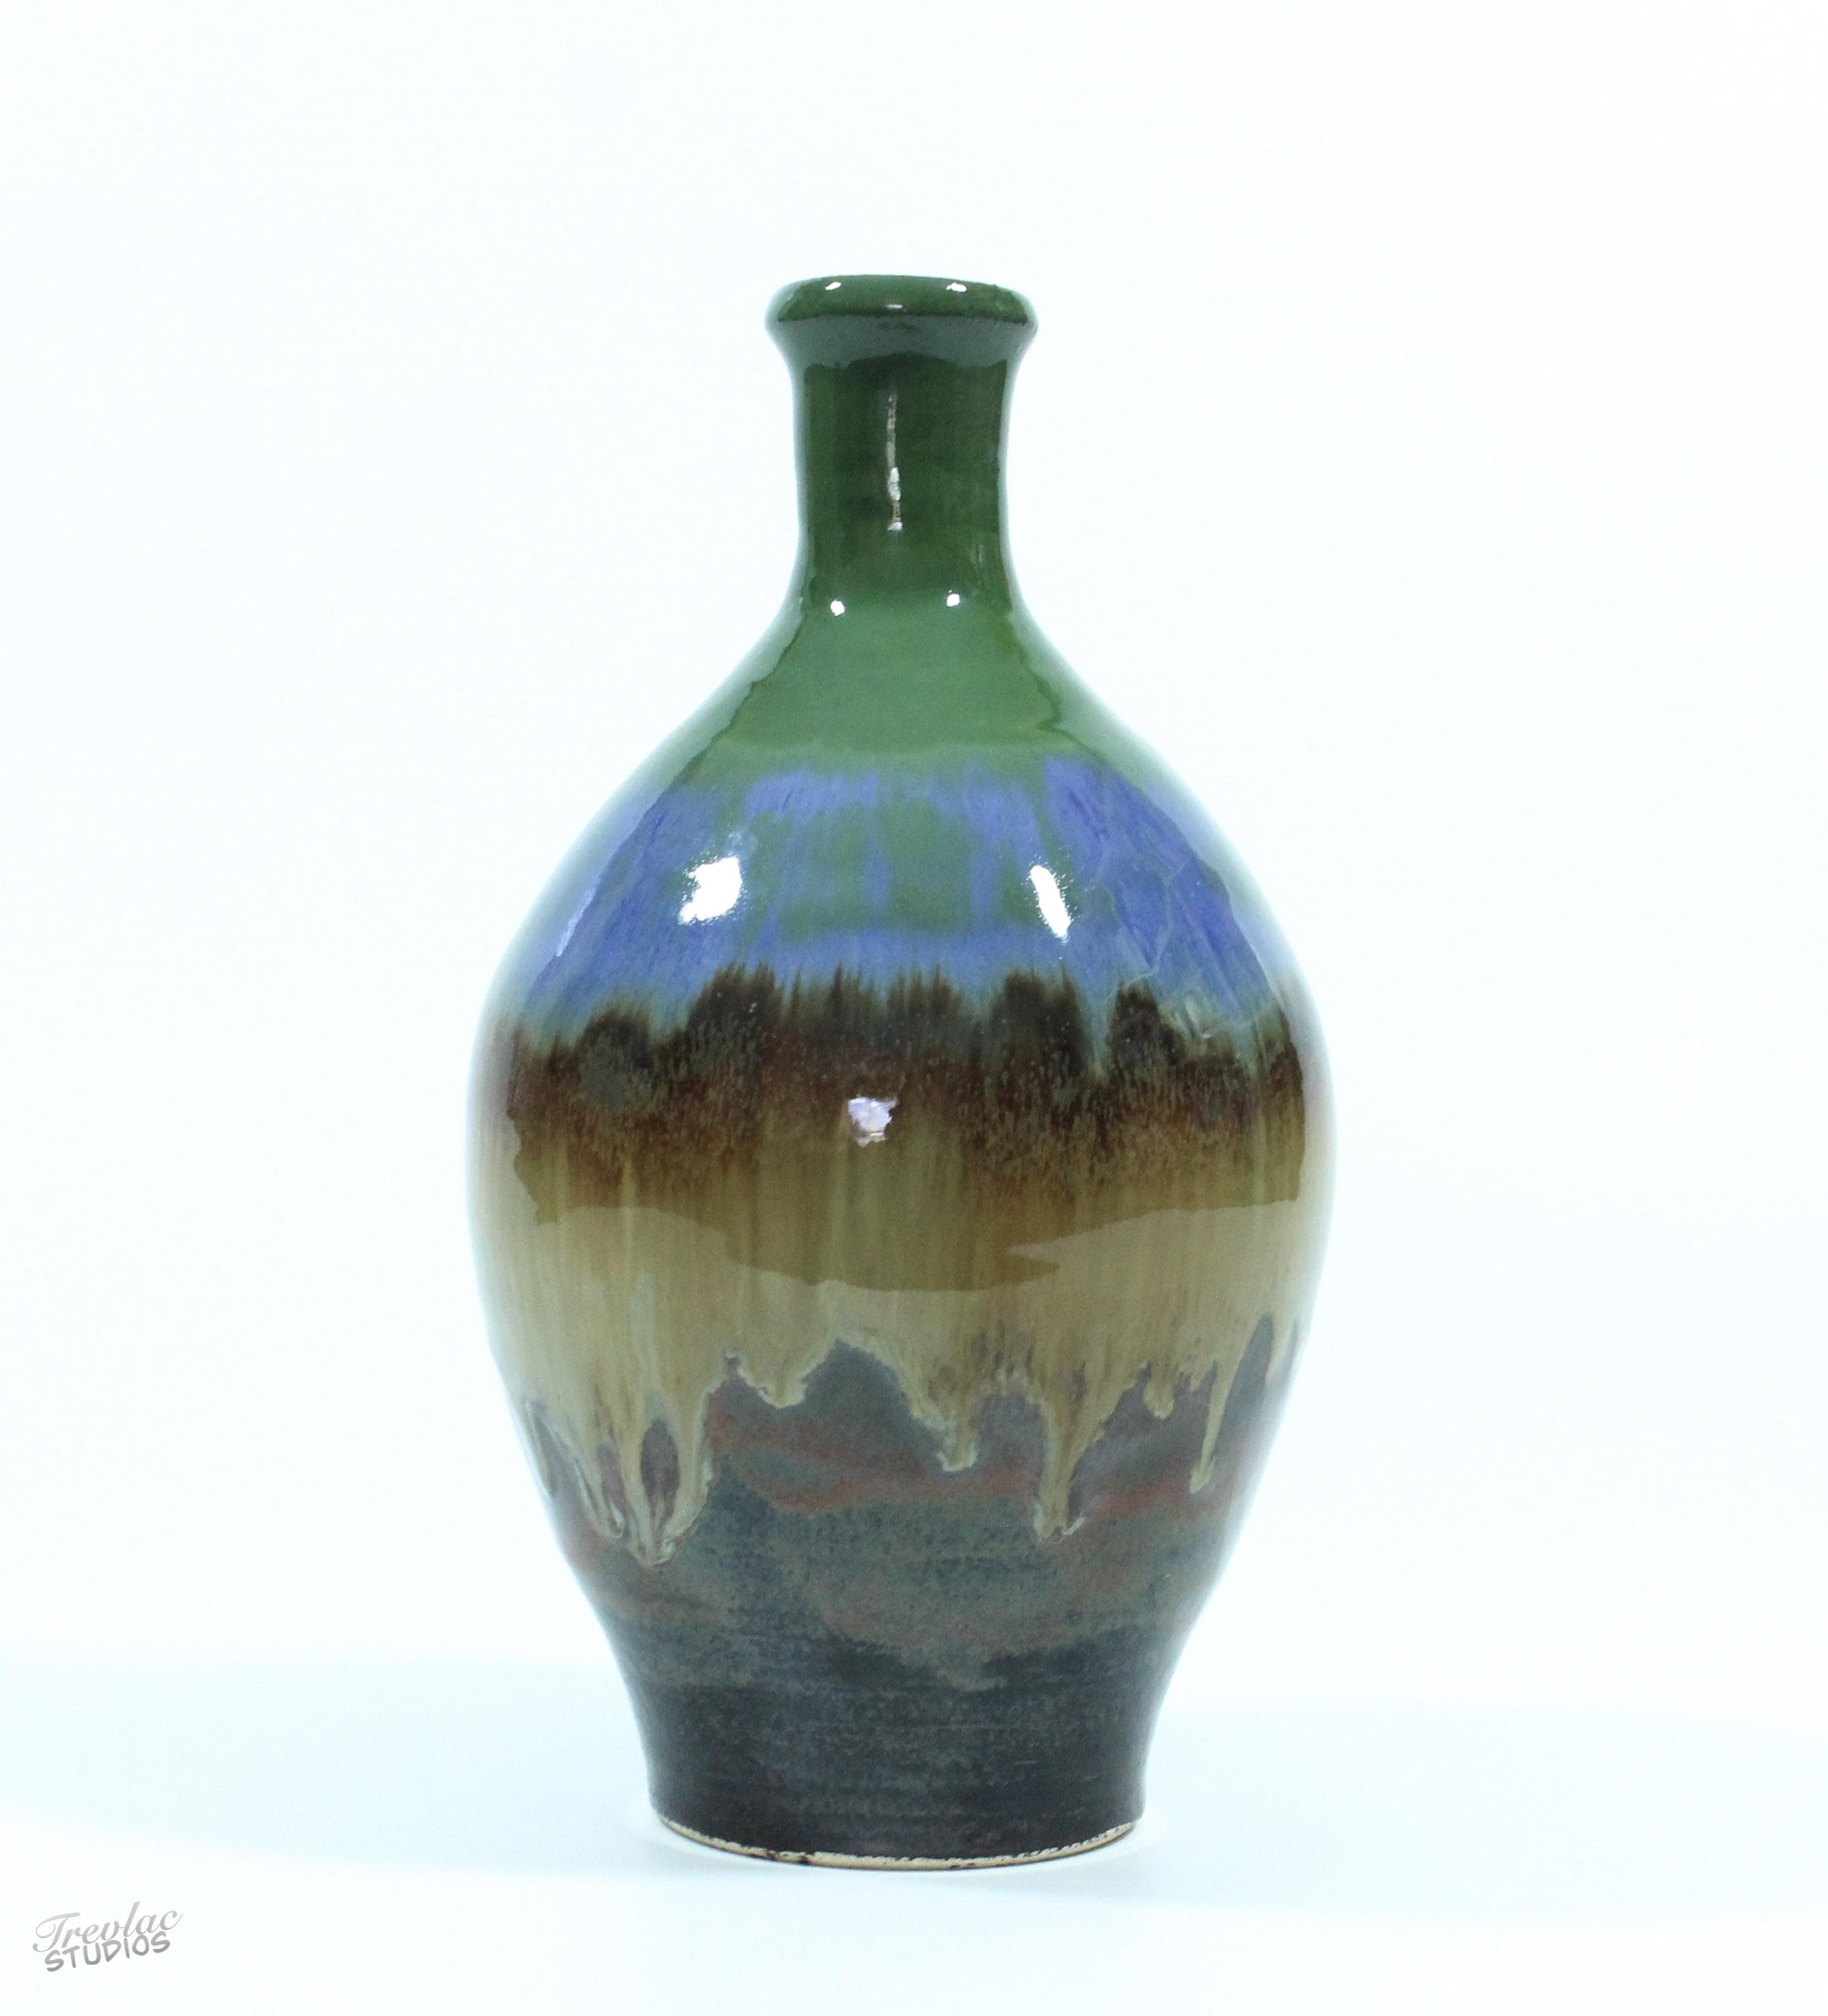 Peter White Arizona Nightfall Woburn Sands Clay The Great Pottery Throw Down